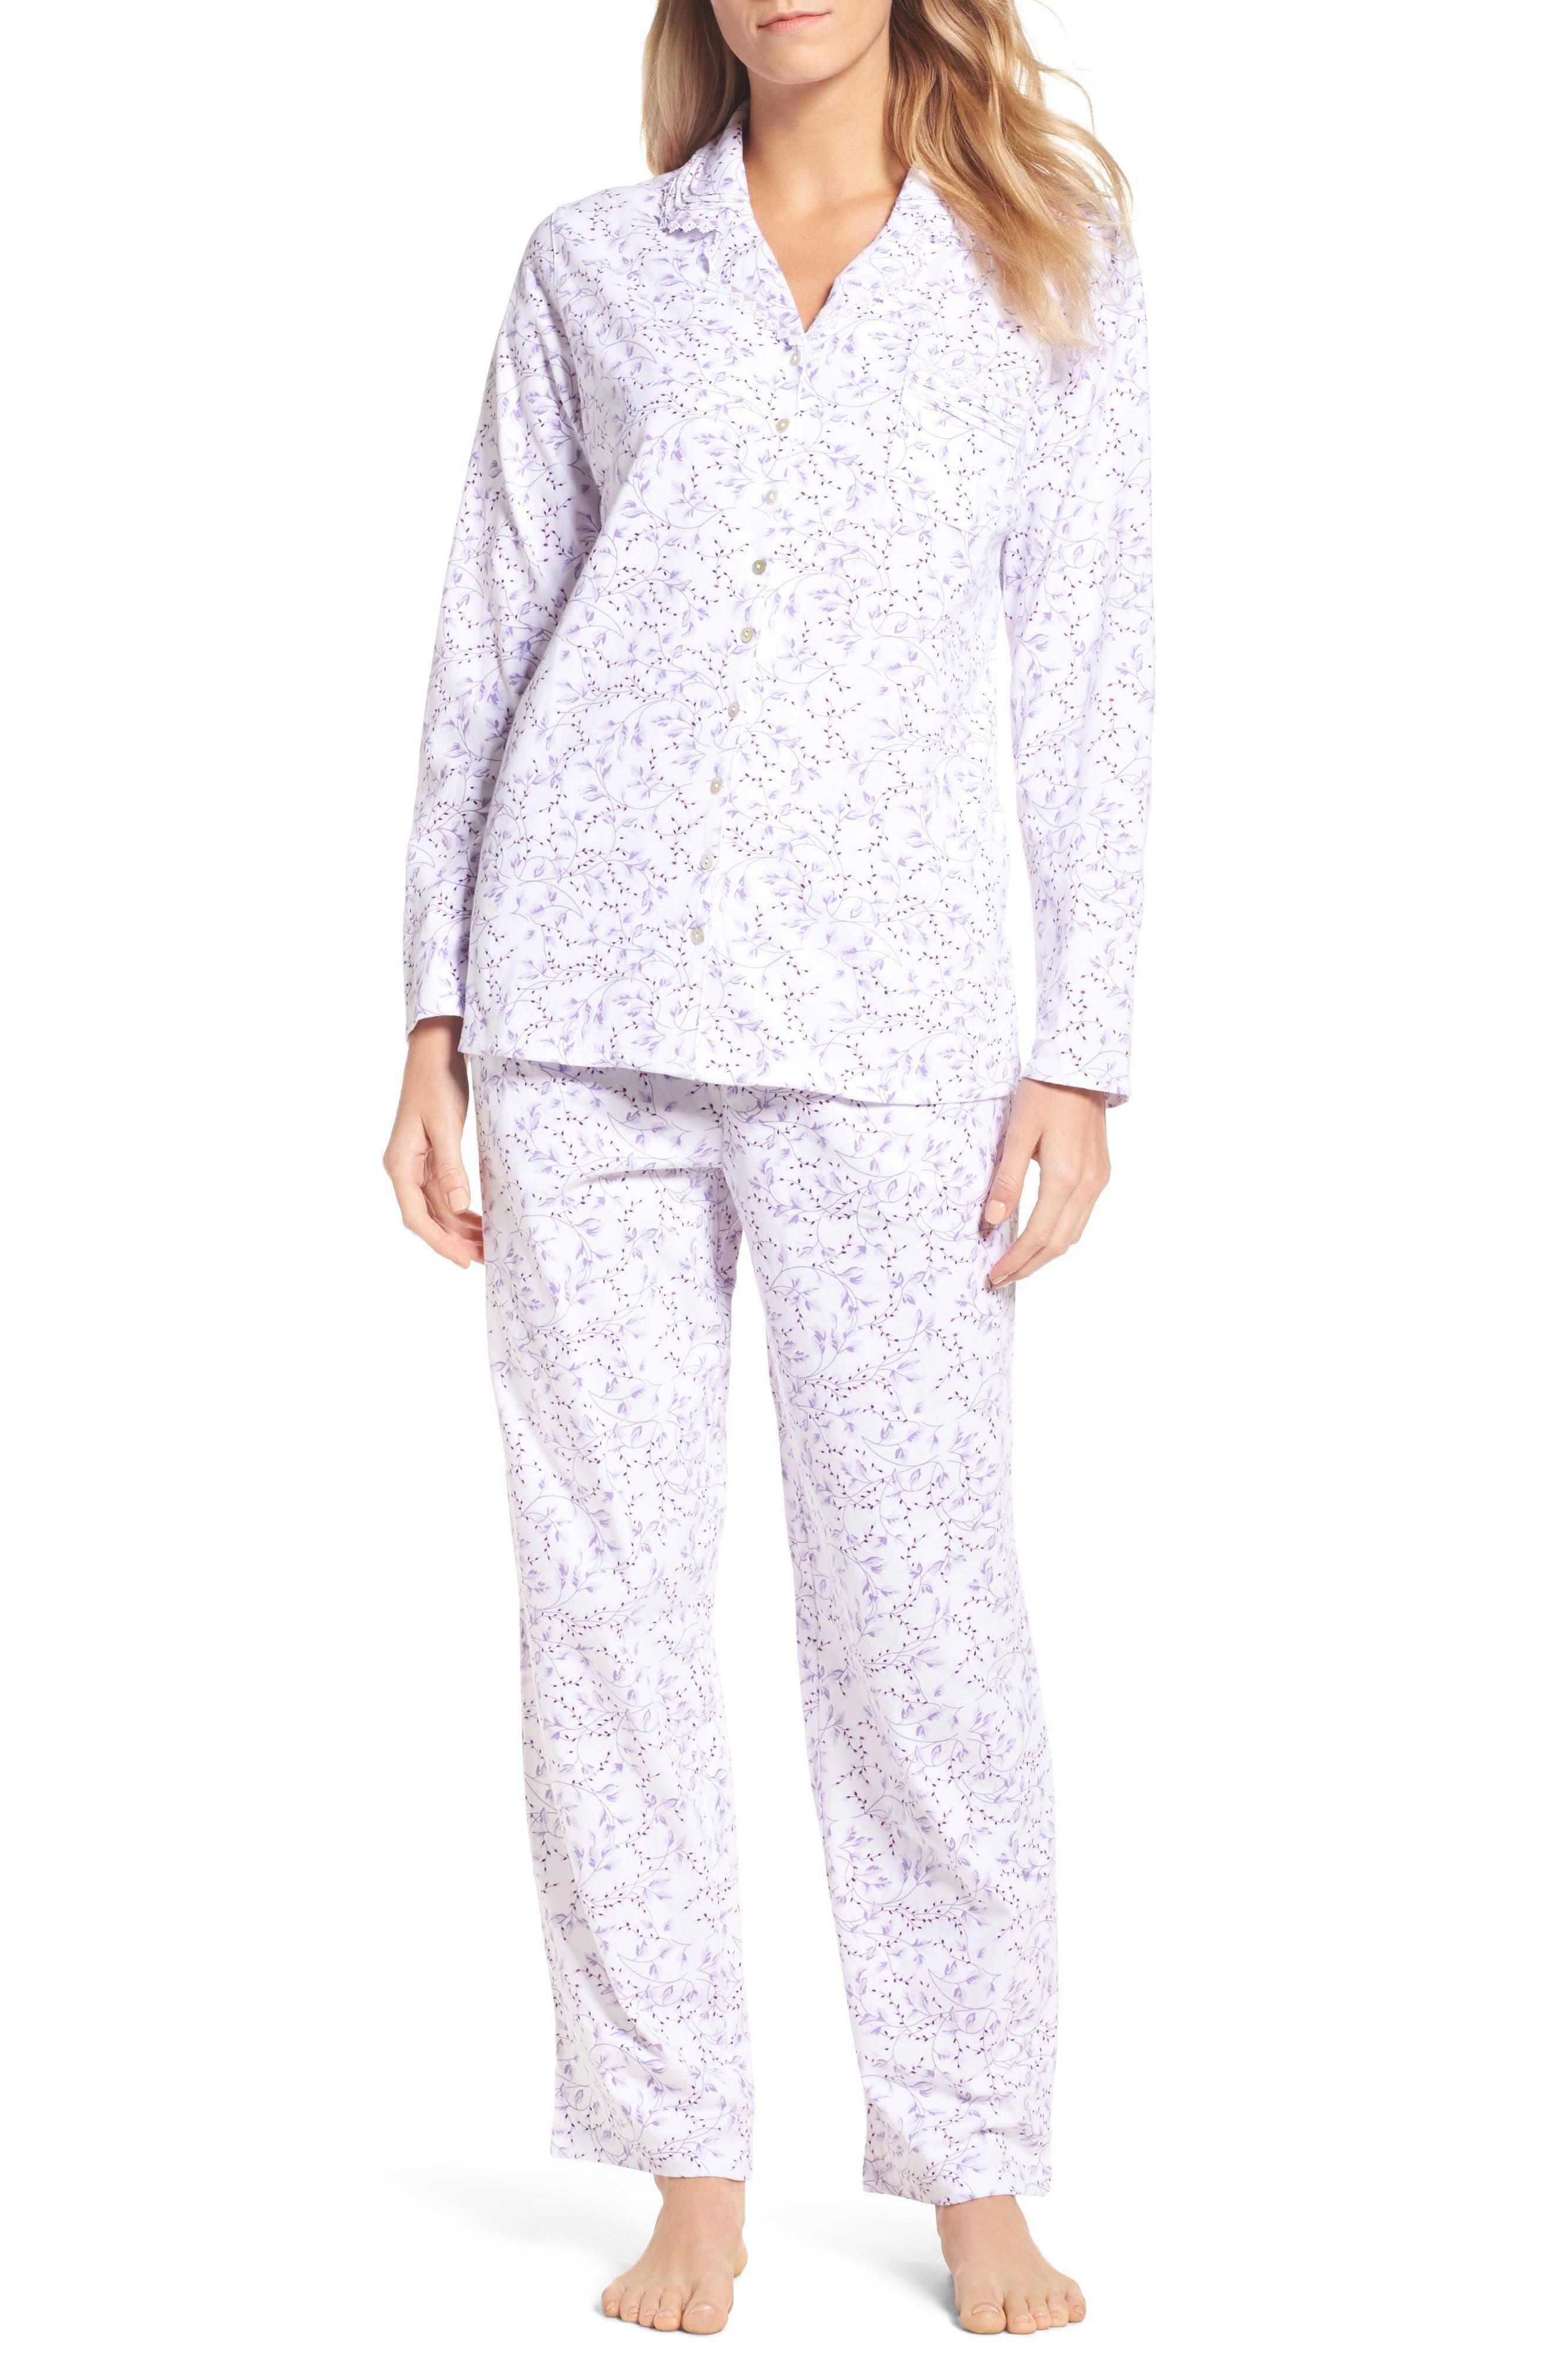 Notch Collar Pajamas,                         Main,                         color, 110